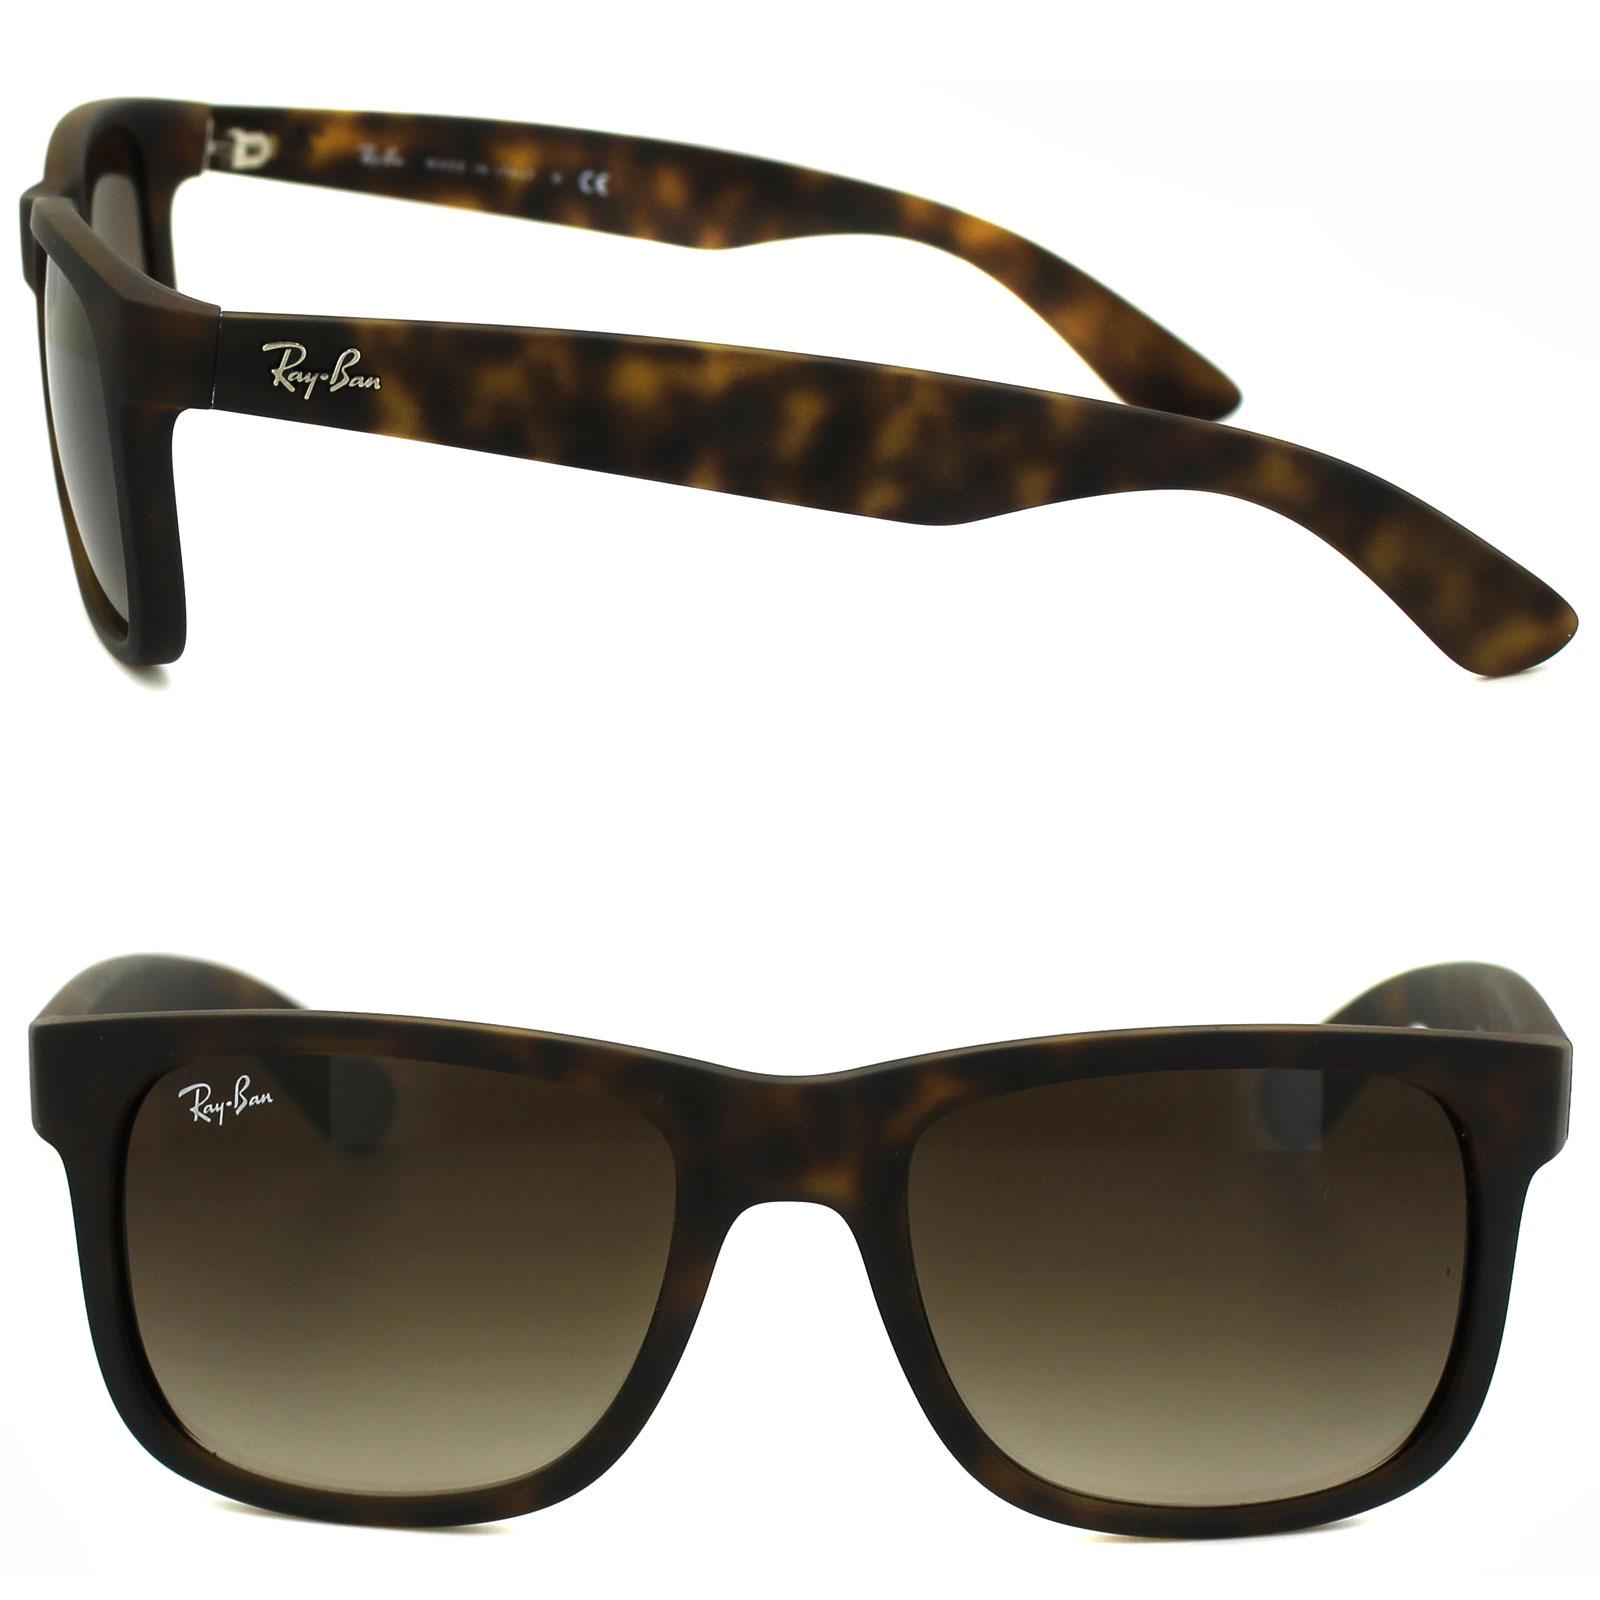 d3c72ca434f Sentinel Ray-Ban Sunglasses Justin 4165 710 13 Rubber Light Havana Brown  Gradient Small